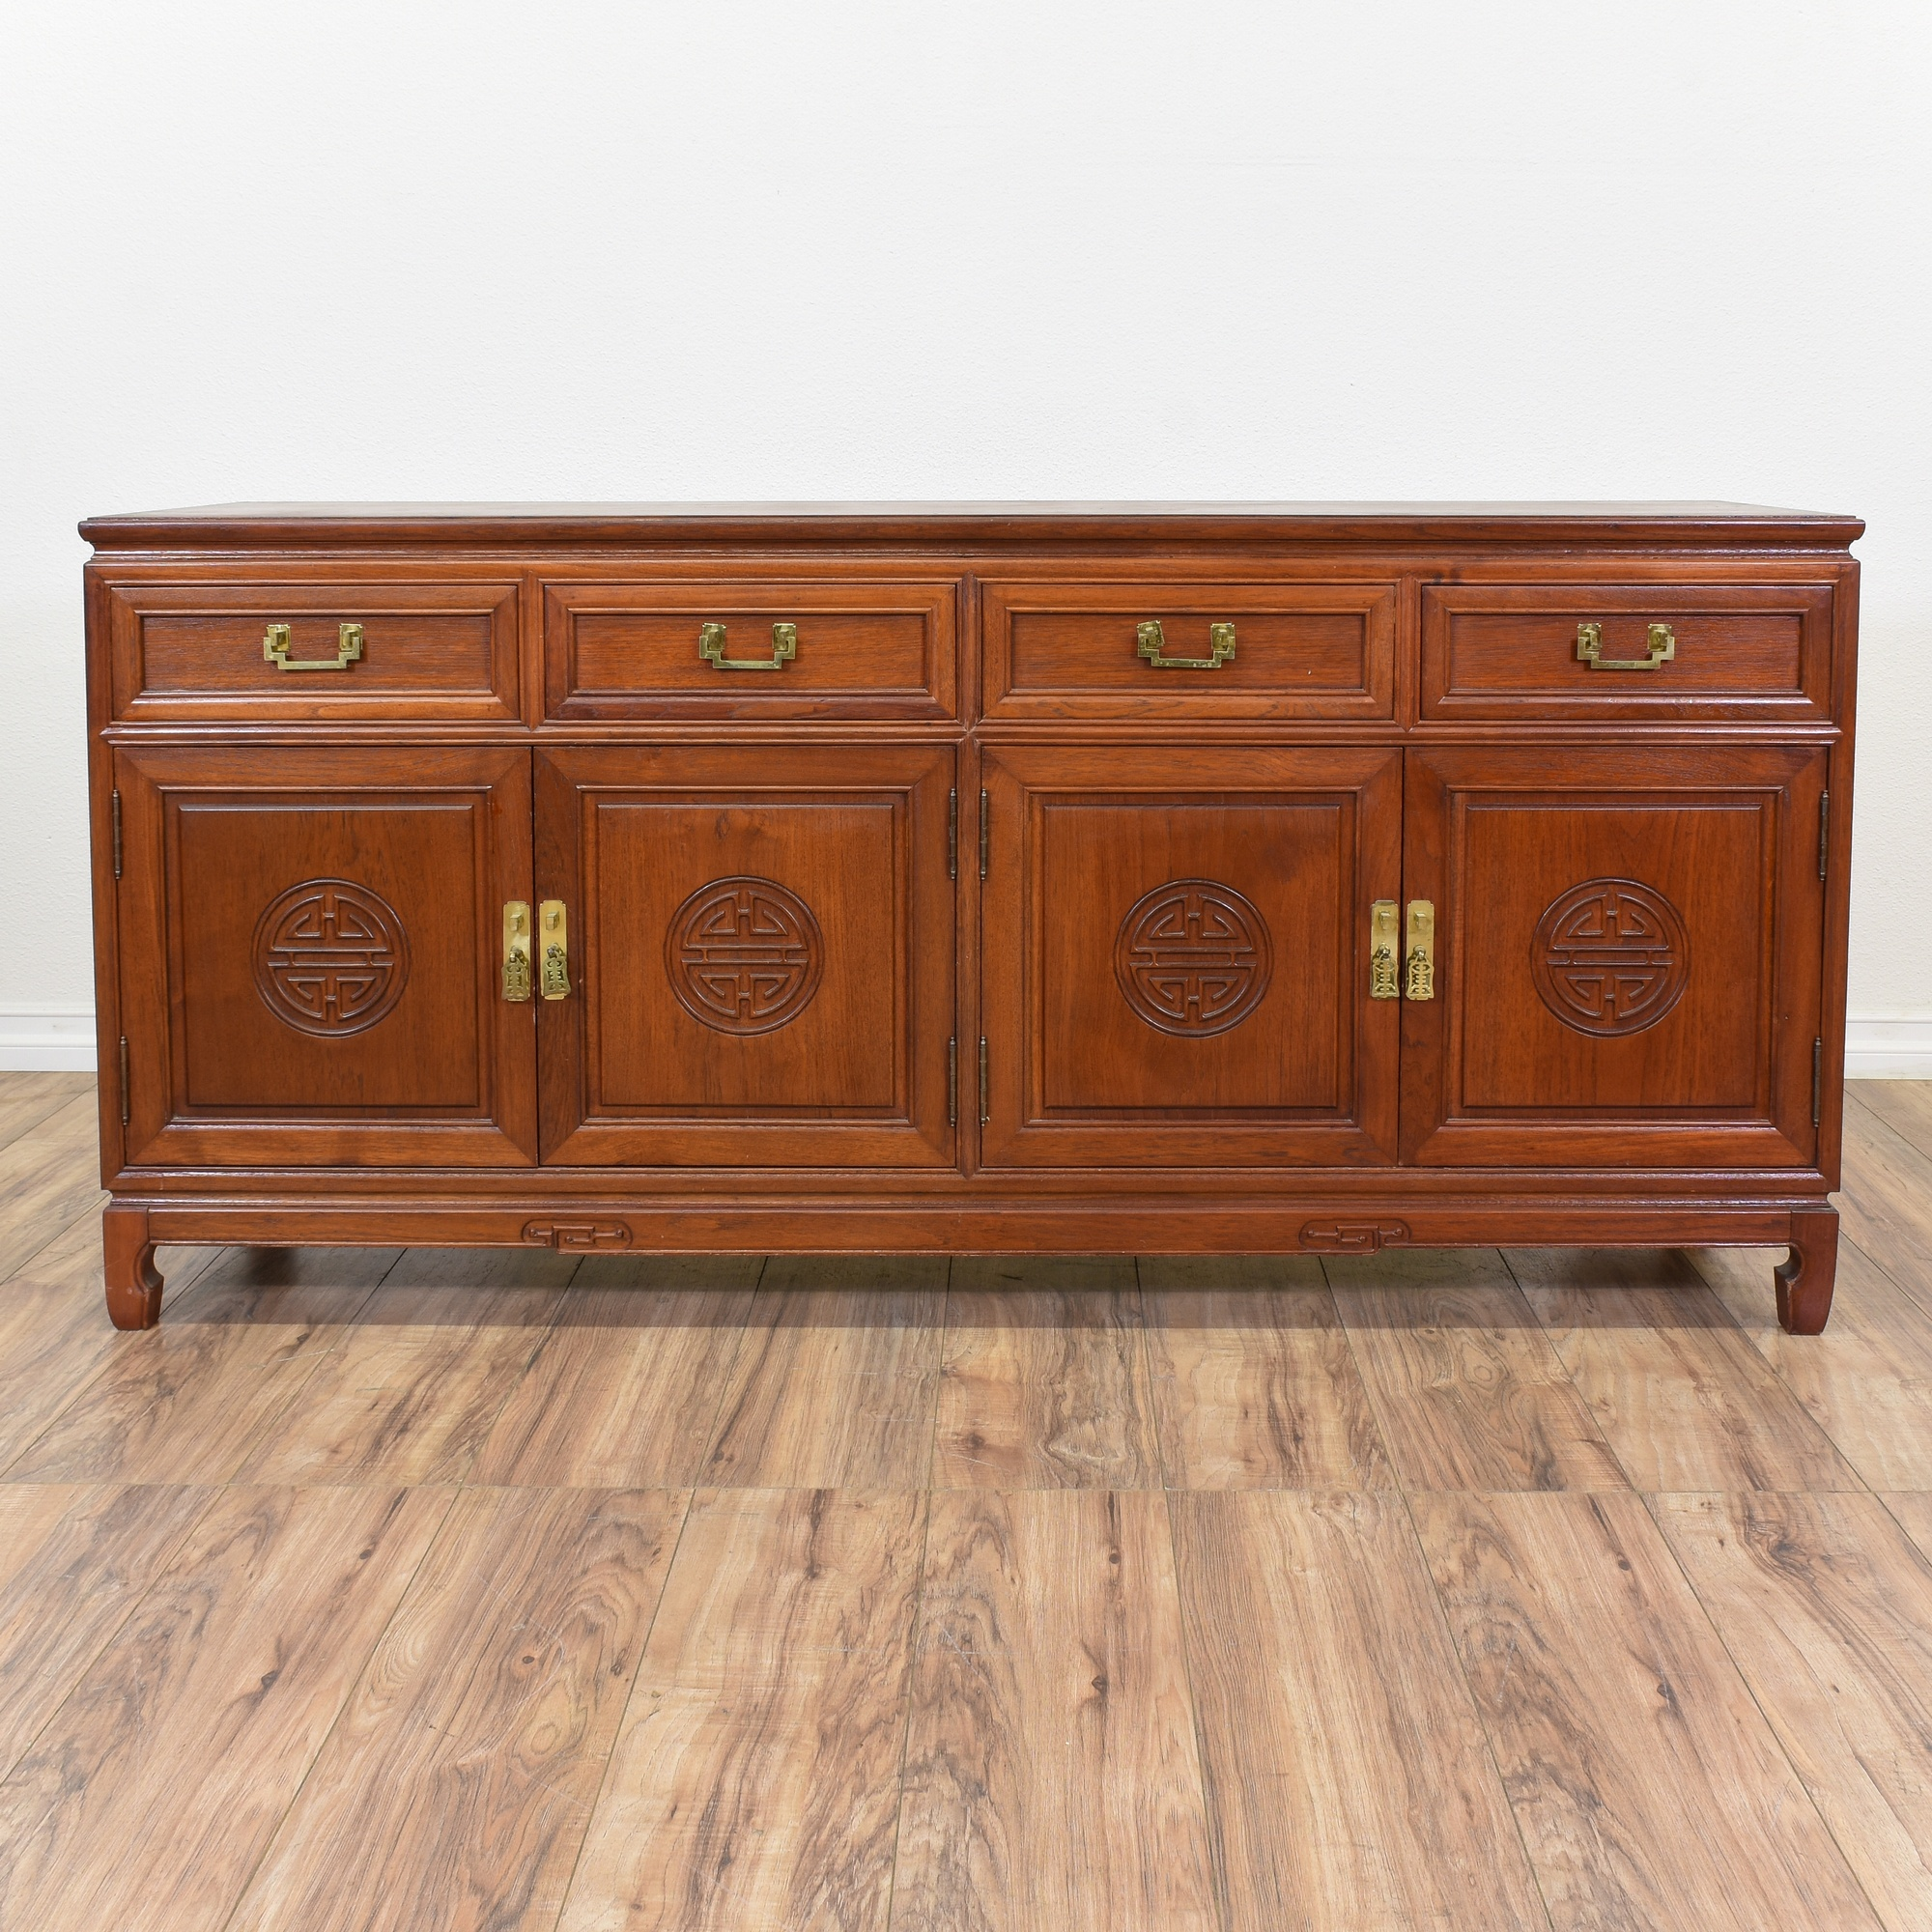 Asian Style Rosewood Buffet Sideboard | Loveseat Vintage Furniture ...